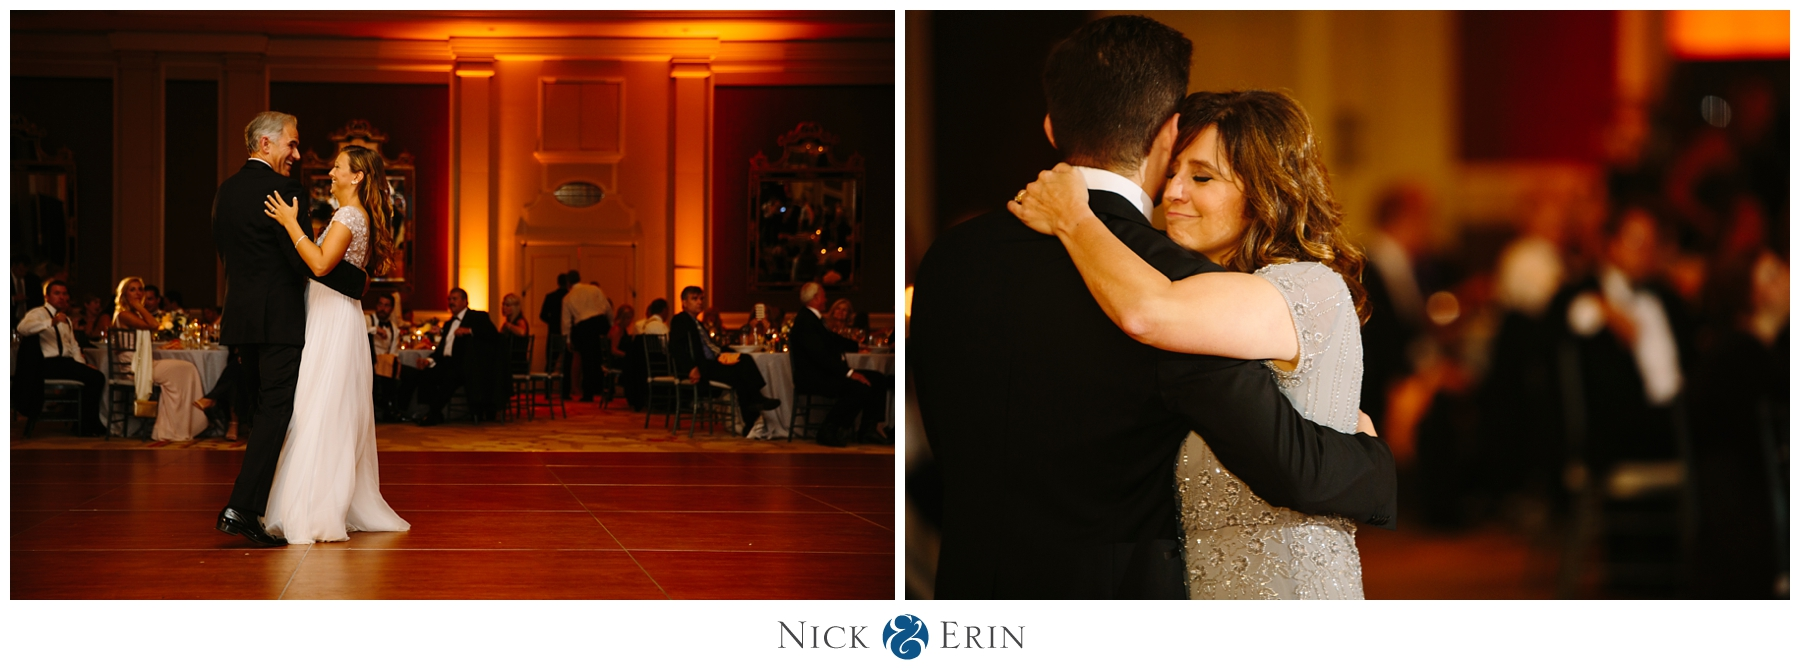 donner_photography_washington-dc-wedding_ariel-patrick_0075